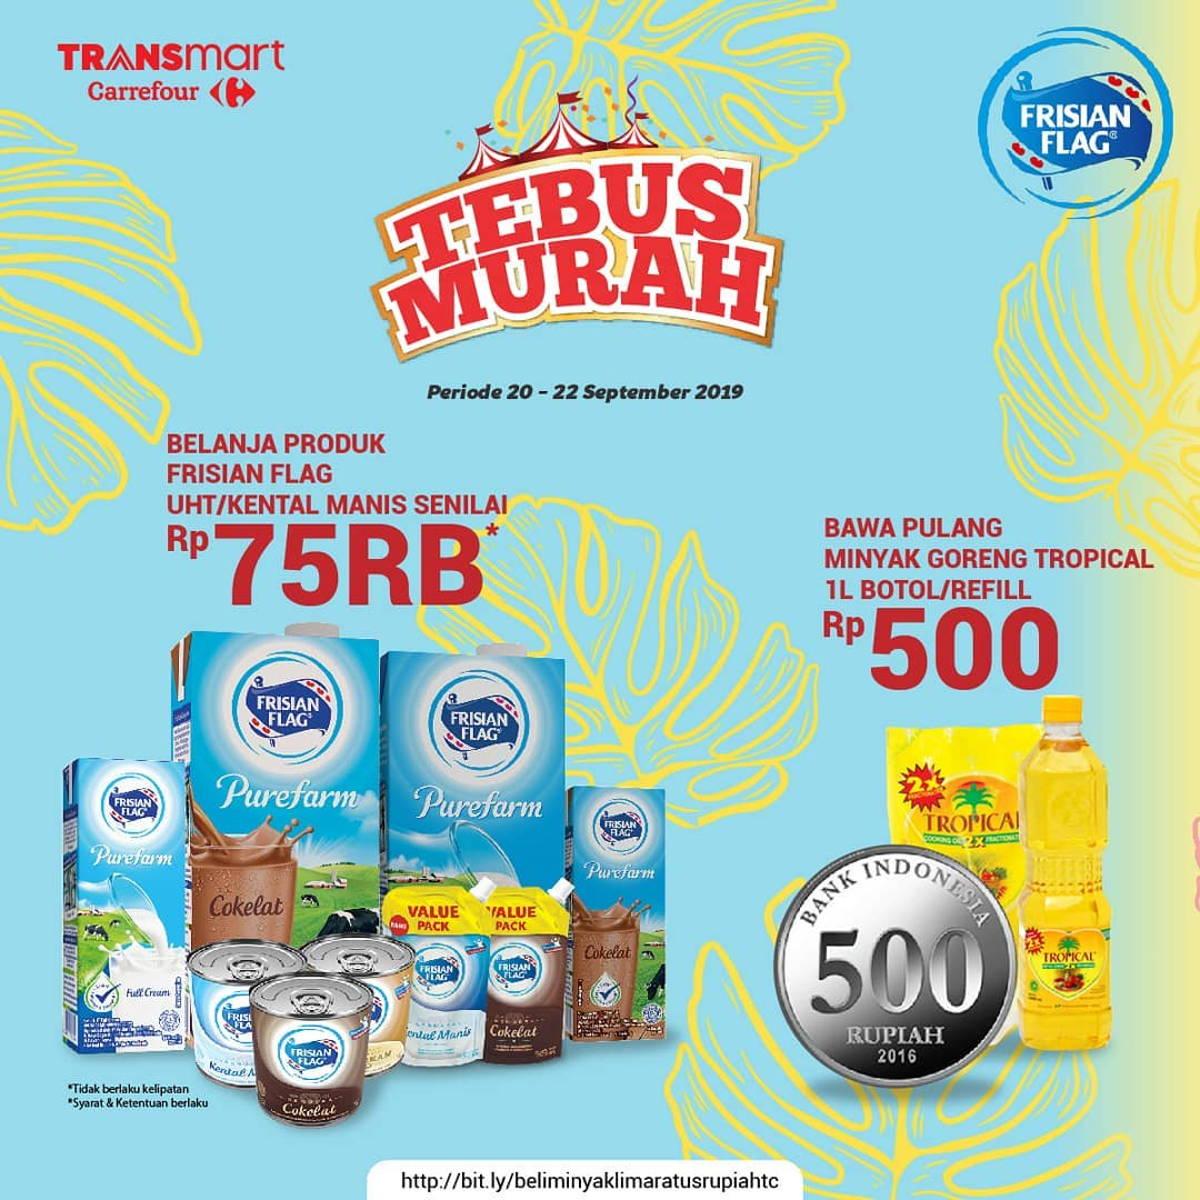 Katalog Promo: TRANSMART CARREFOUR: Promo TEBUS MURAH Minyak Goreng / Kecap Hanya Rp. 500 - 3